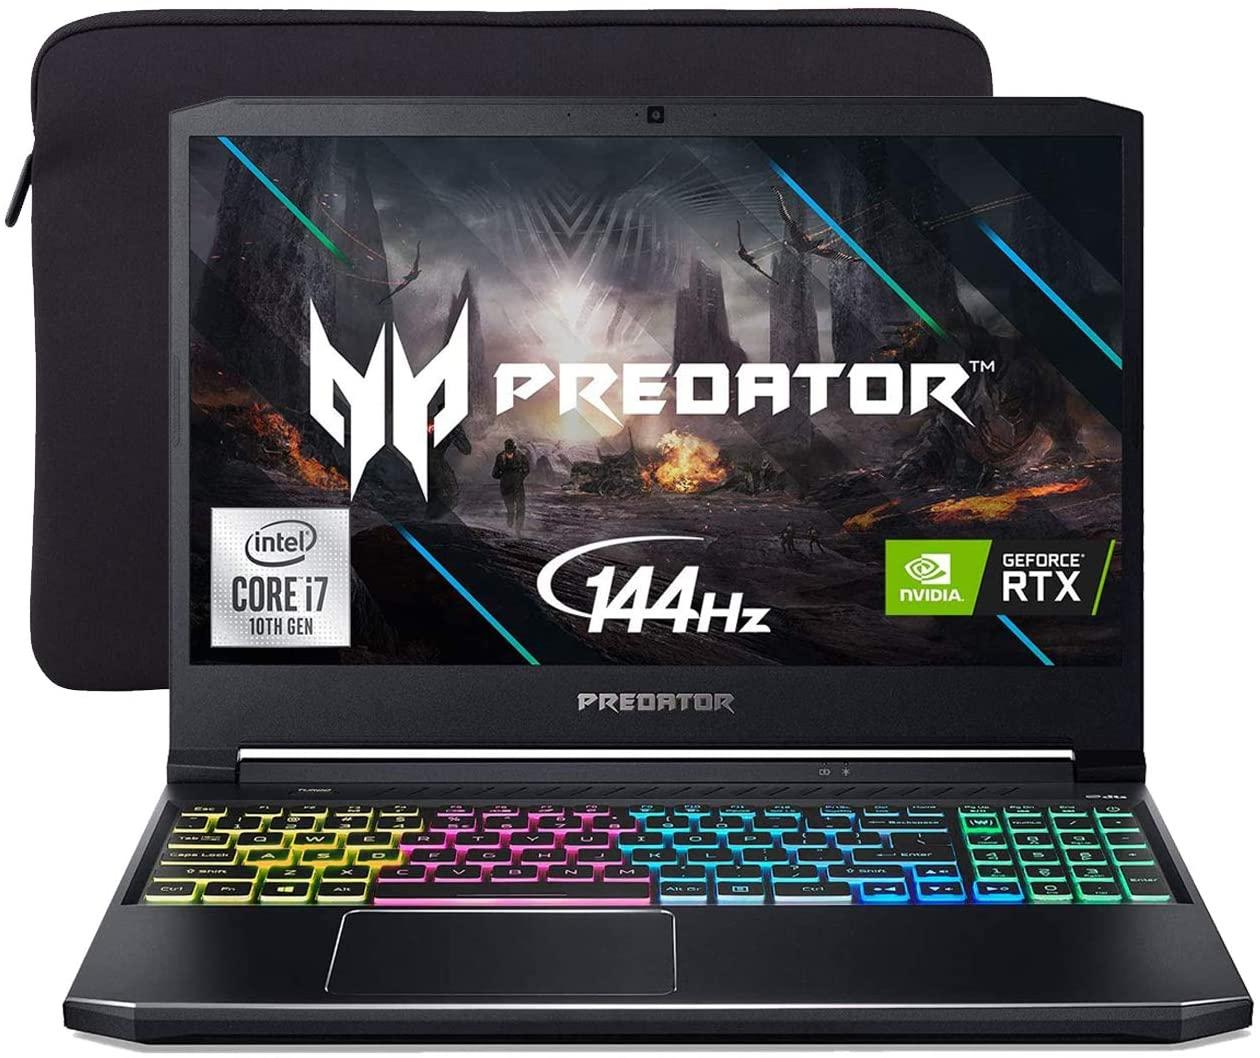 Acer Predator Helios 300 144Hz Gaming Laptop, 15.6